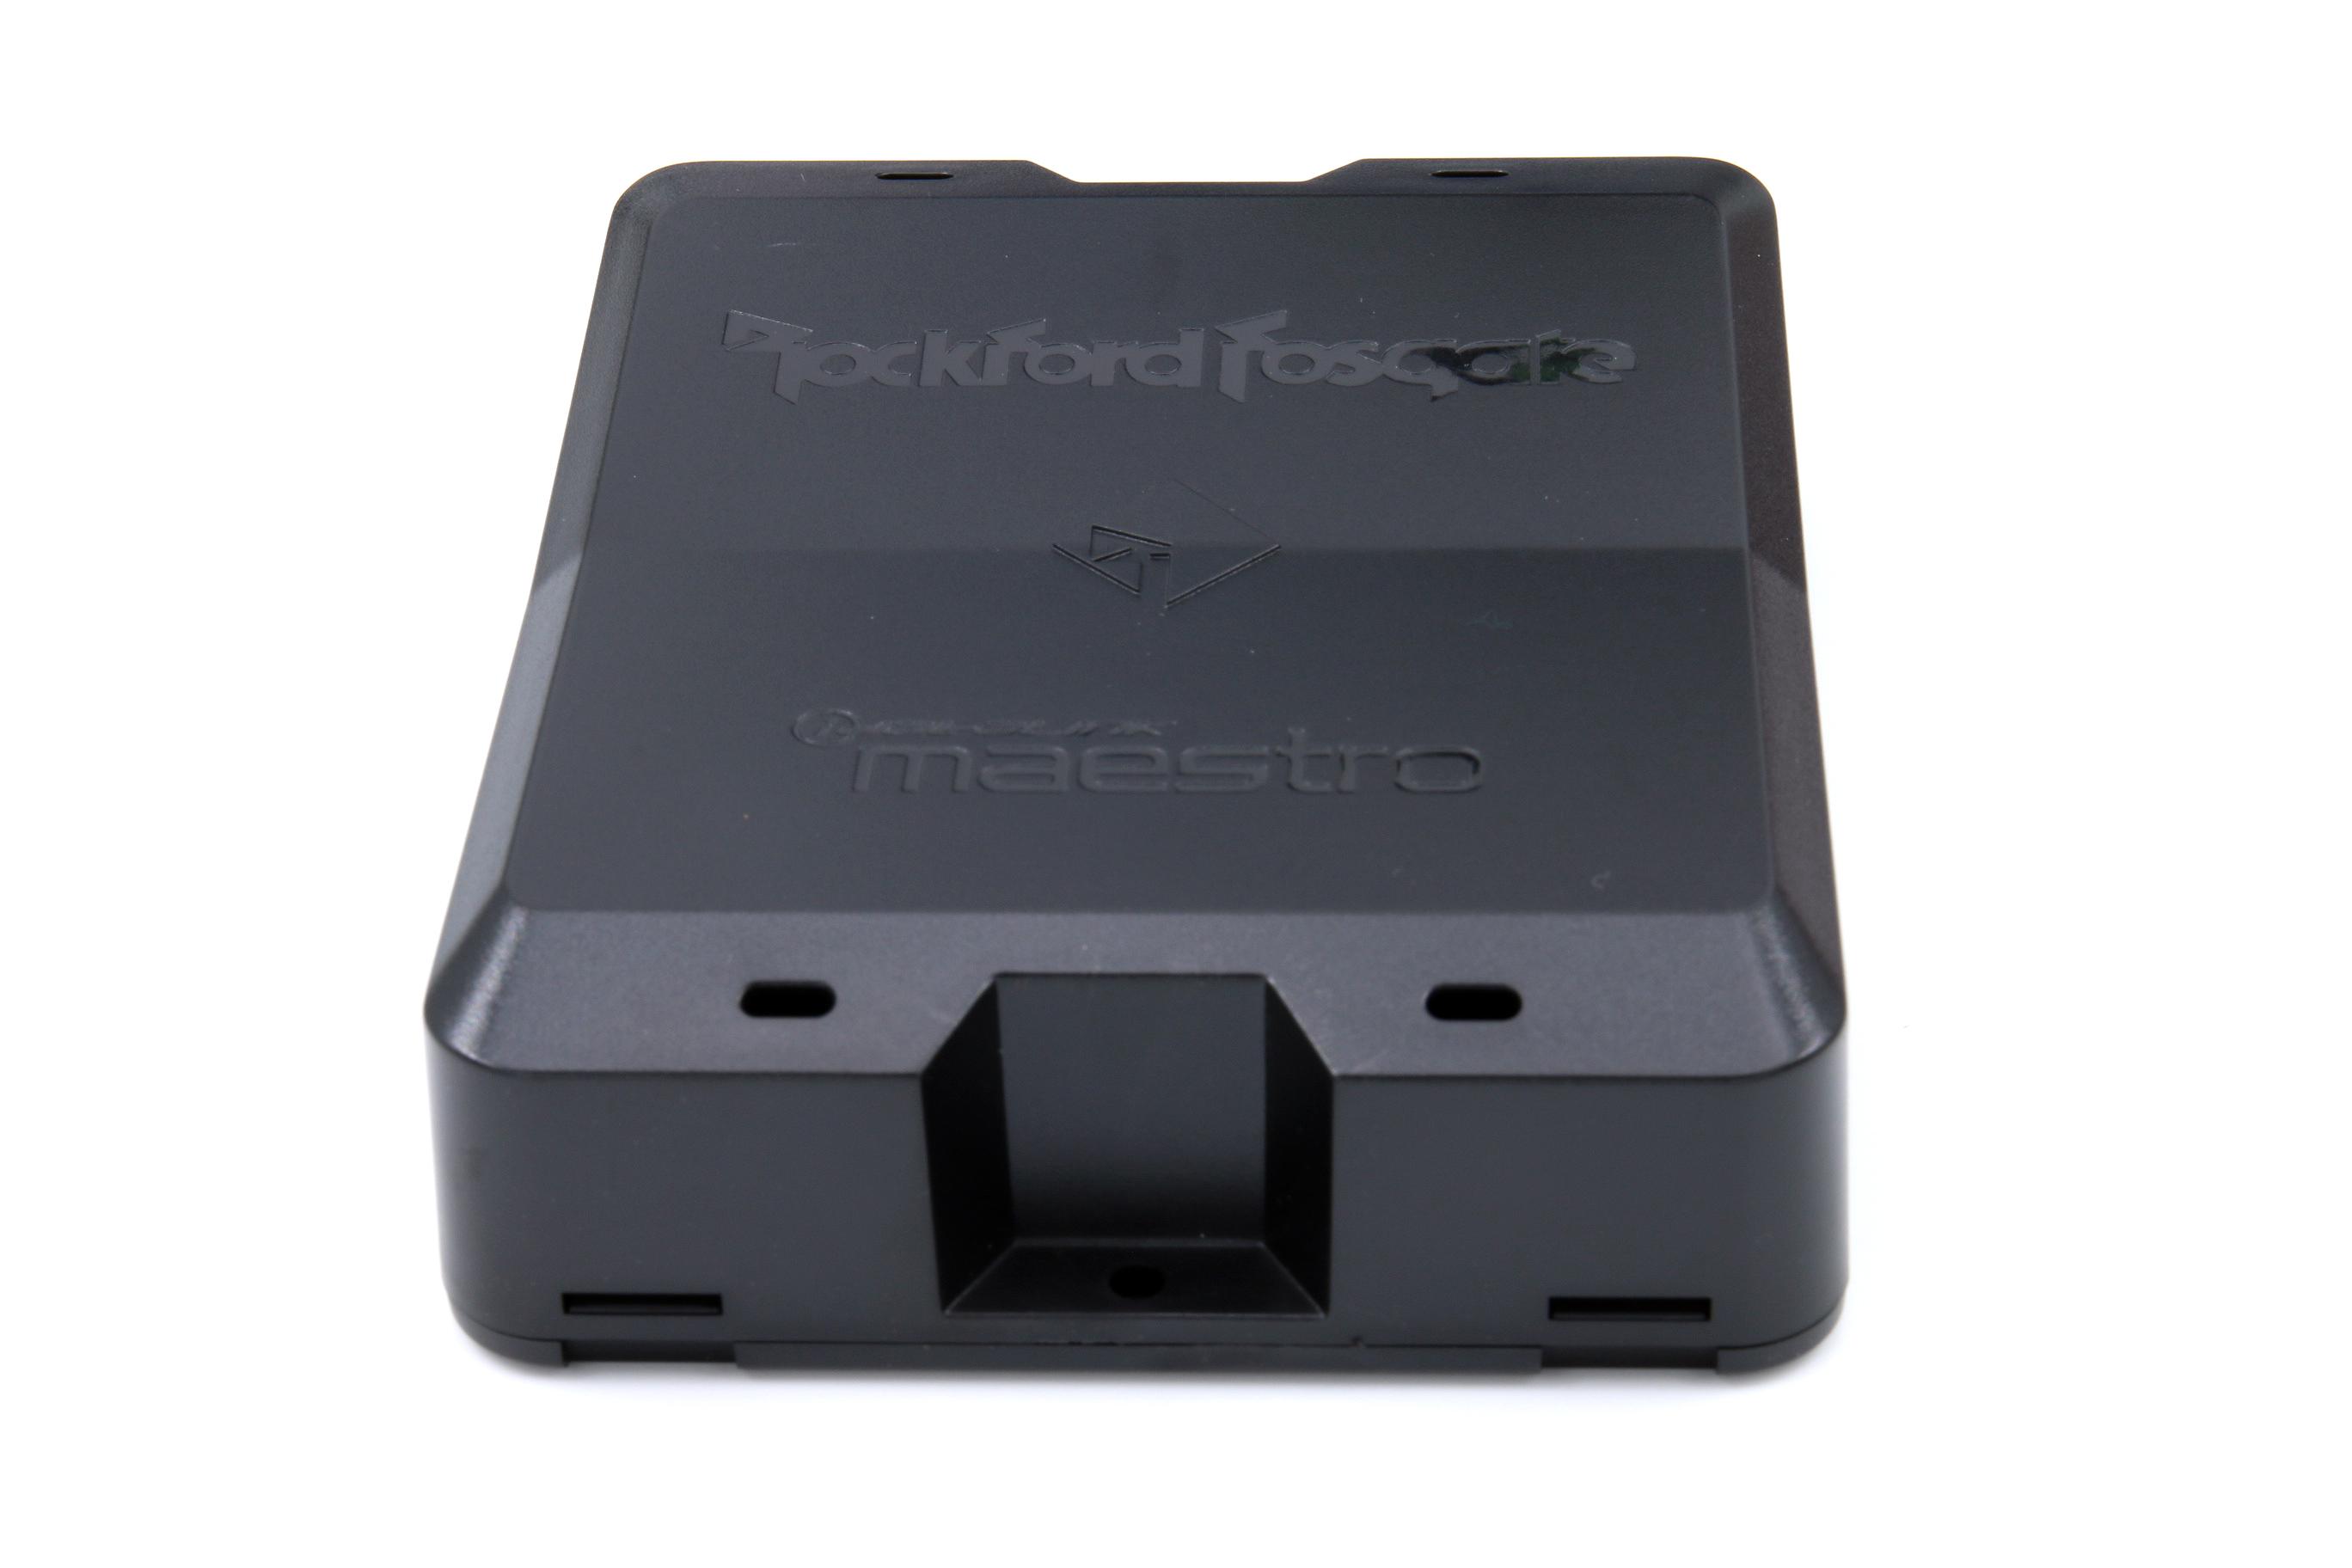 Rockford Fosgate DRS1-